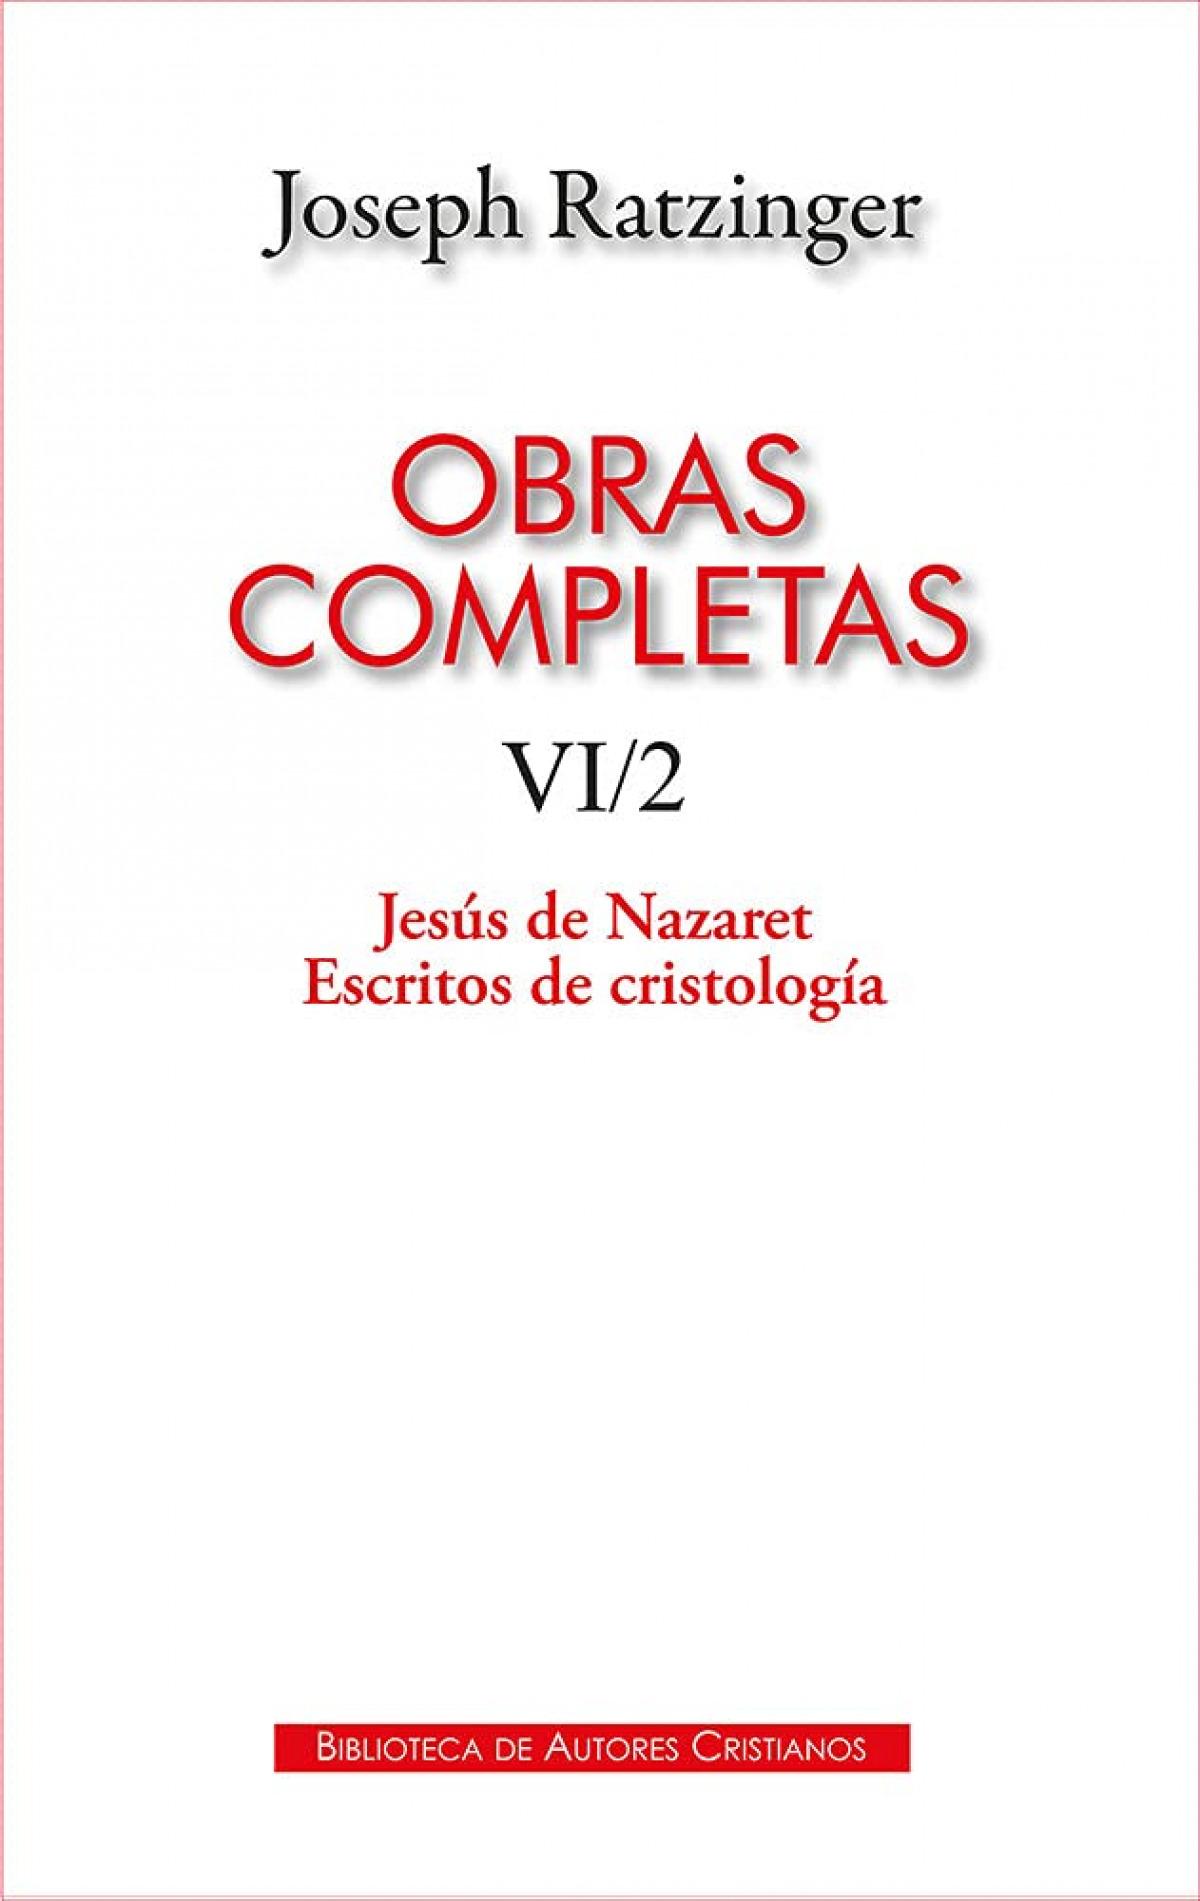 OBRAS COMPLETAS DE JOSEPH RATZINGER. VI;2